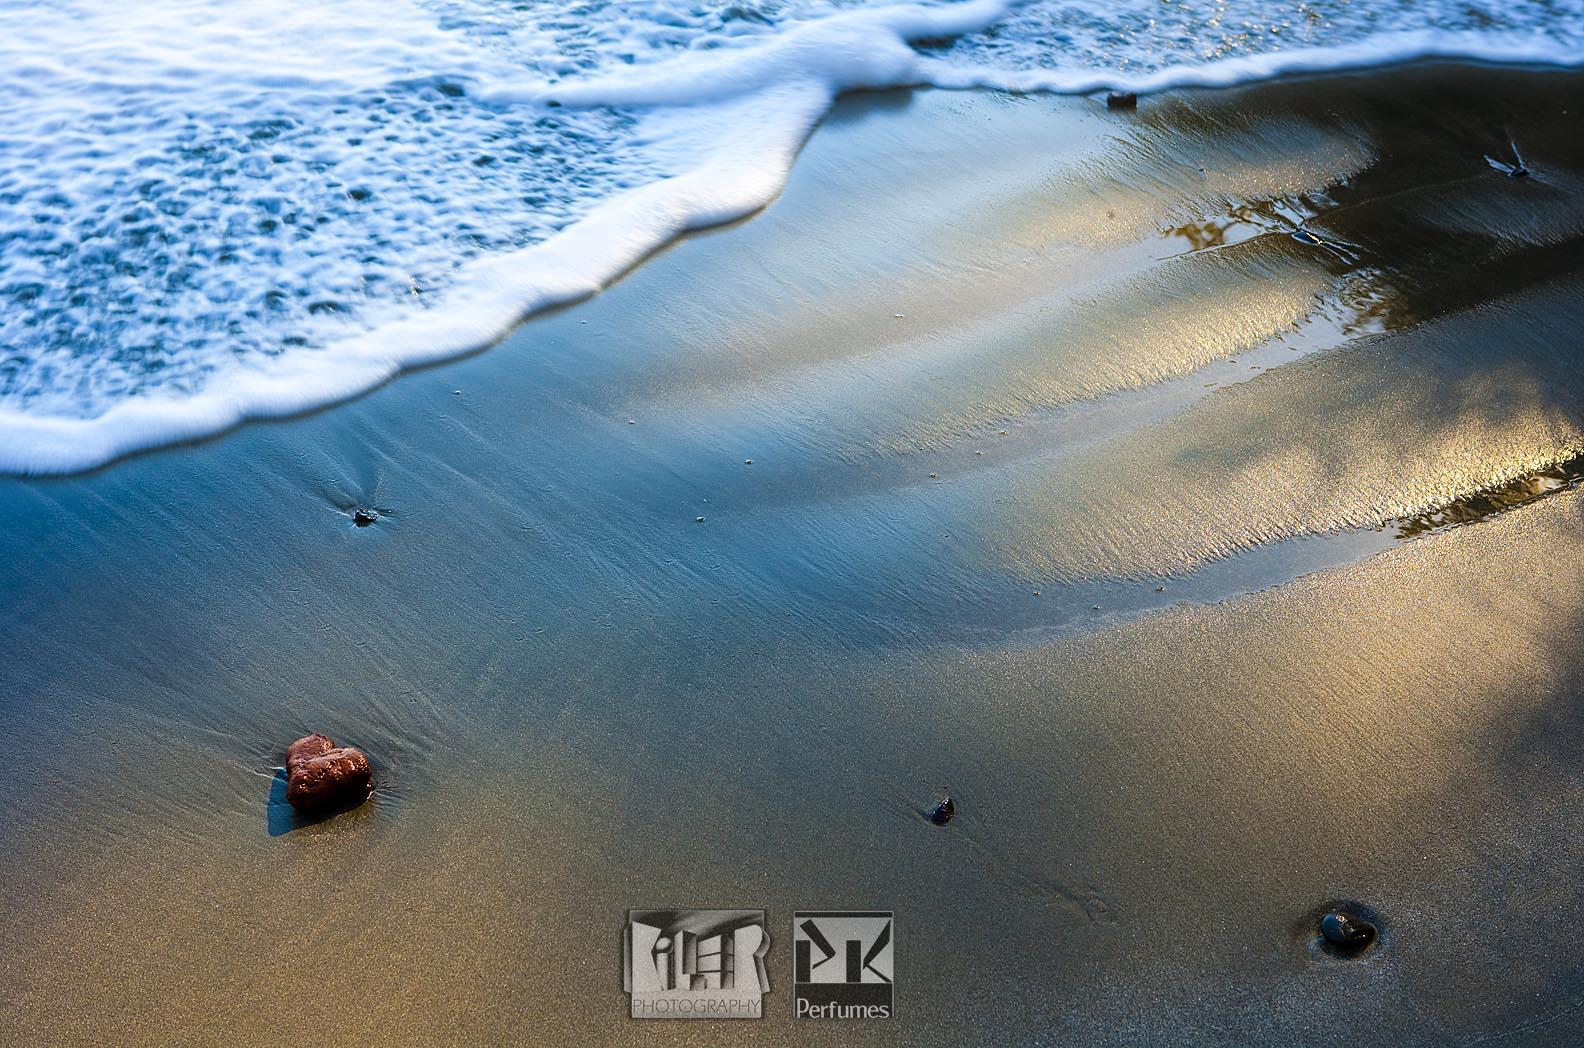 Heart Stone on Beach - PK Perfumes